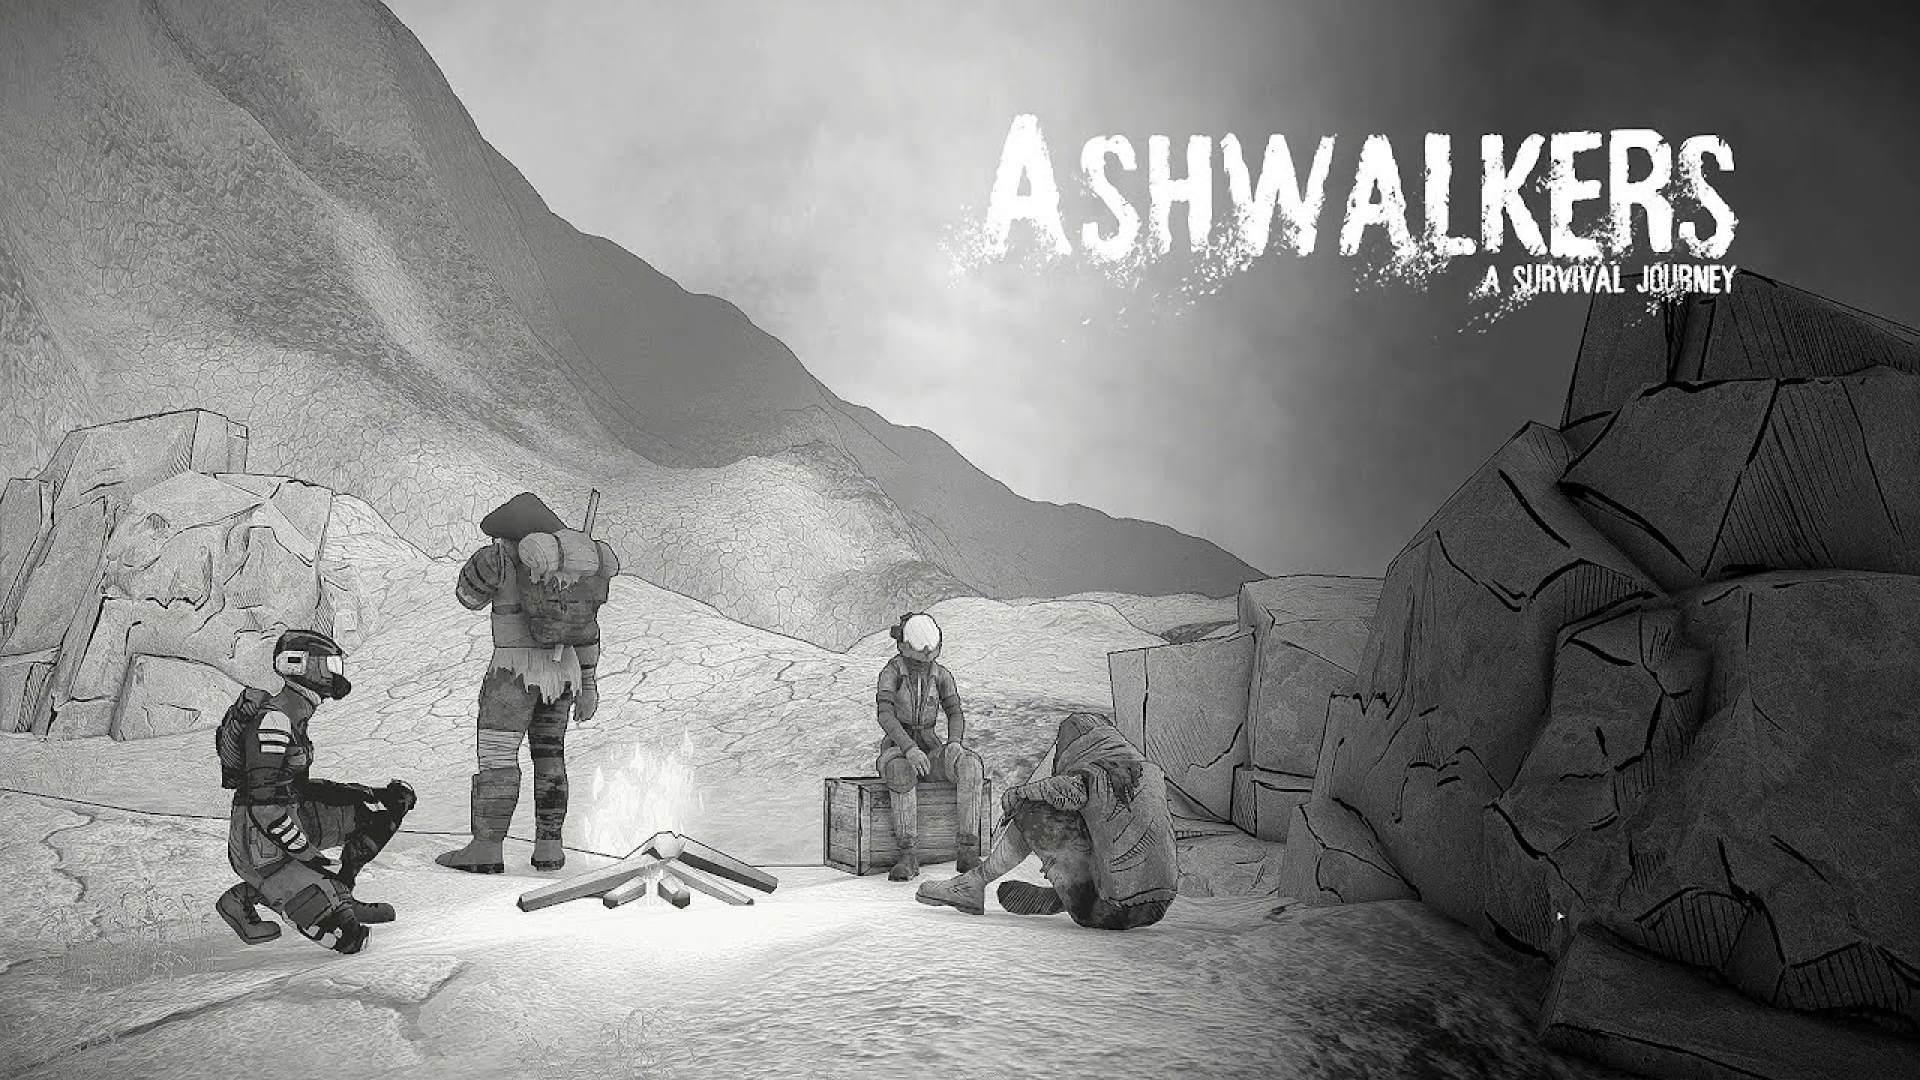 ashwalkers-couverture-article.jpg